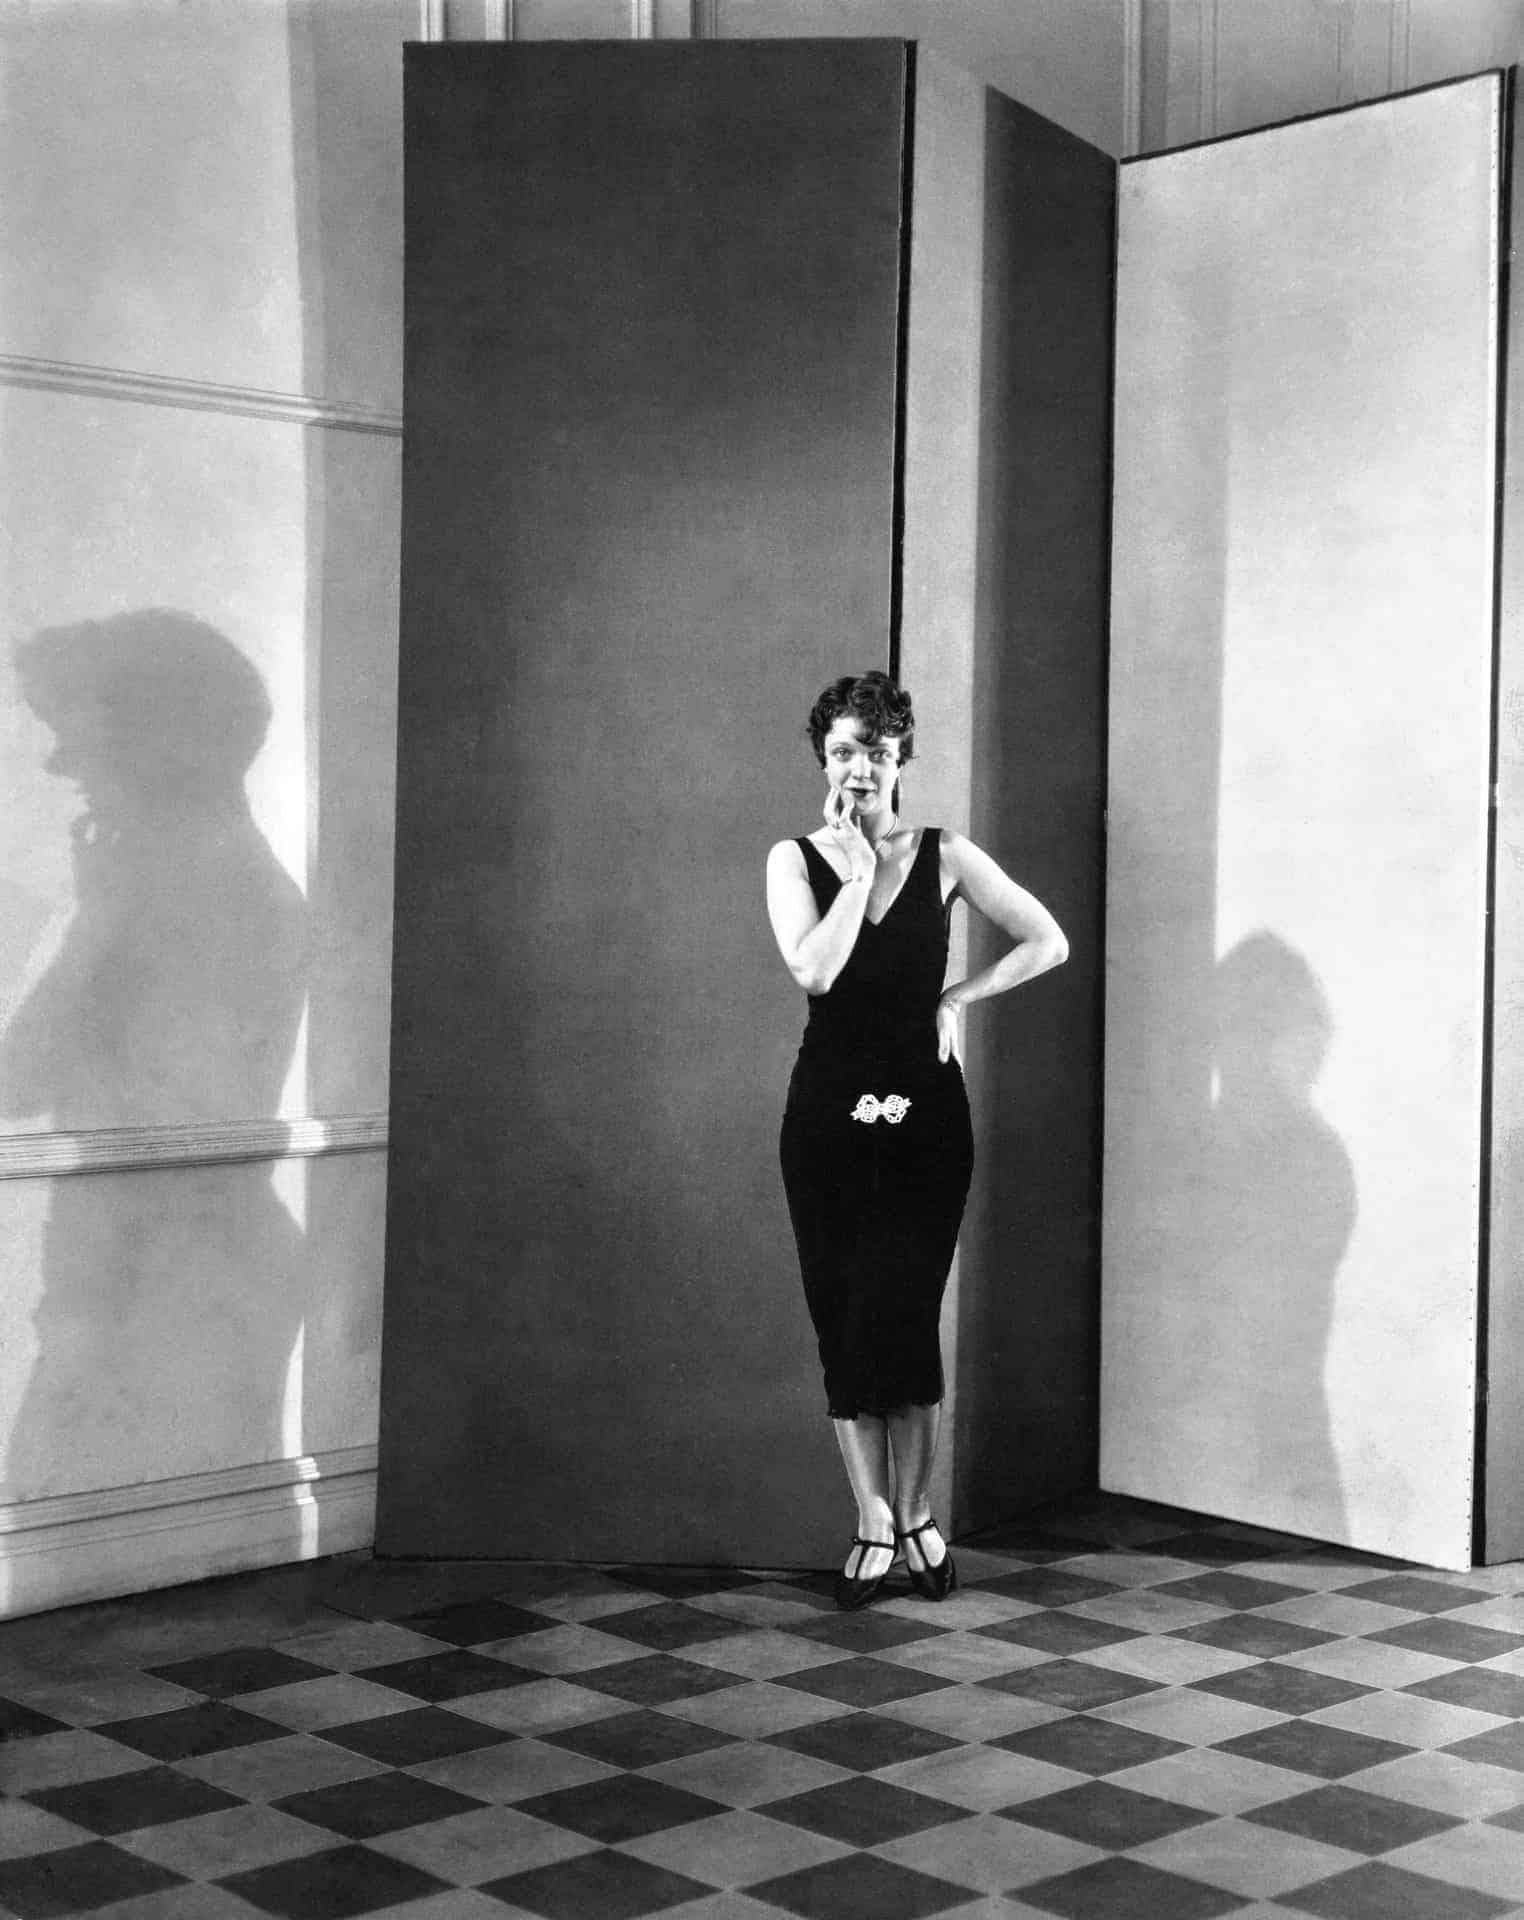 Charles Sheeler (1883-1965), Bobbe Arnst, Vanity Fair, July 1, 1928. © Conde Nast.